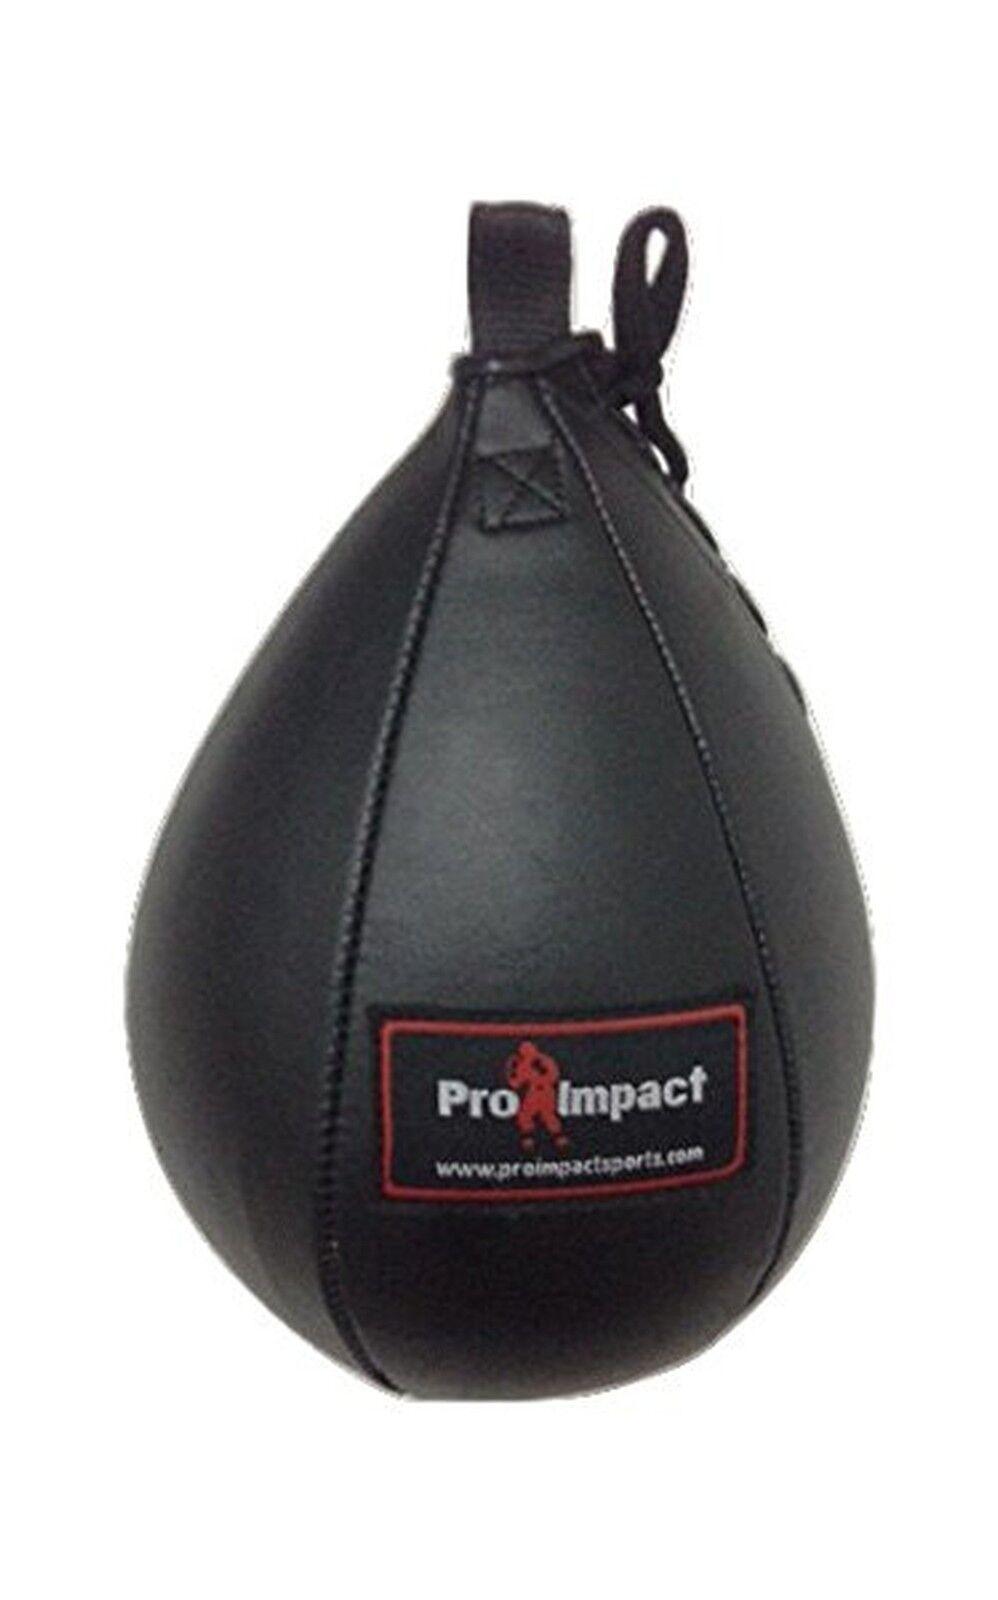 Pro Impact Durahide Speedbag XS - 5  x 7  Free Shipping